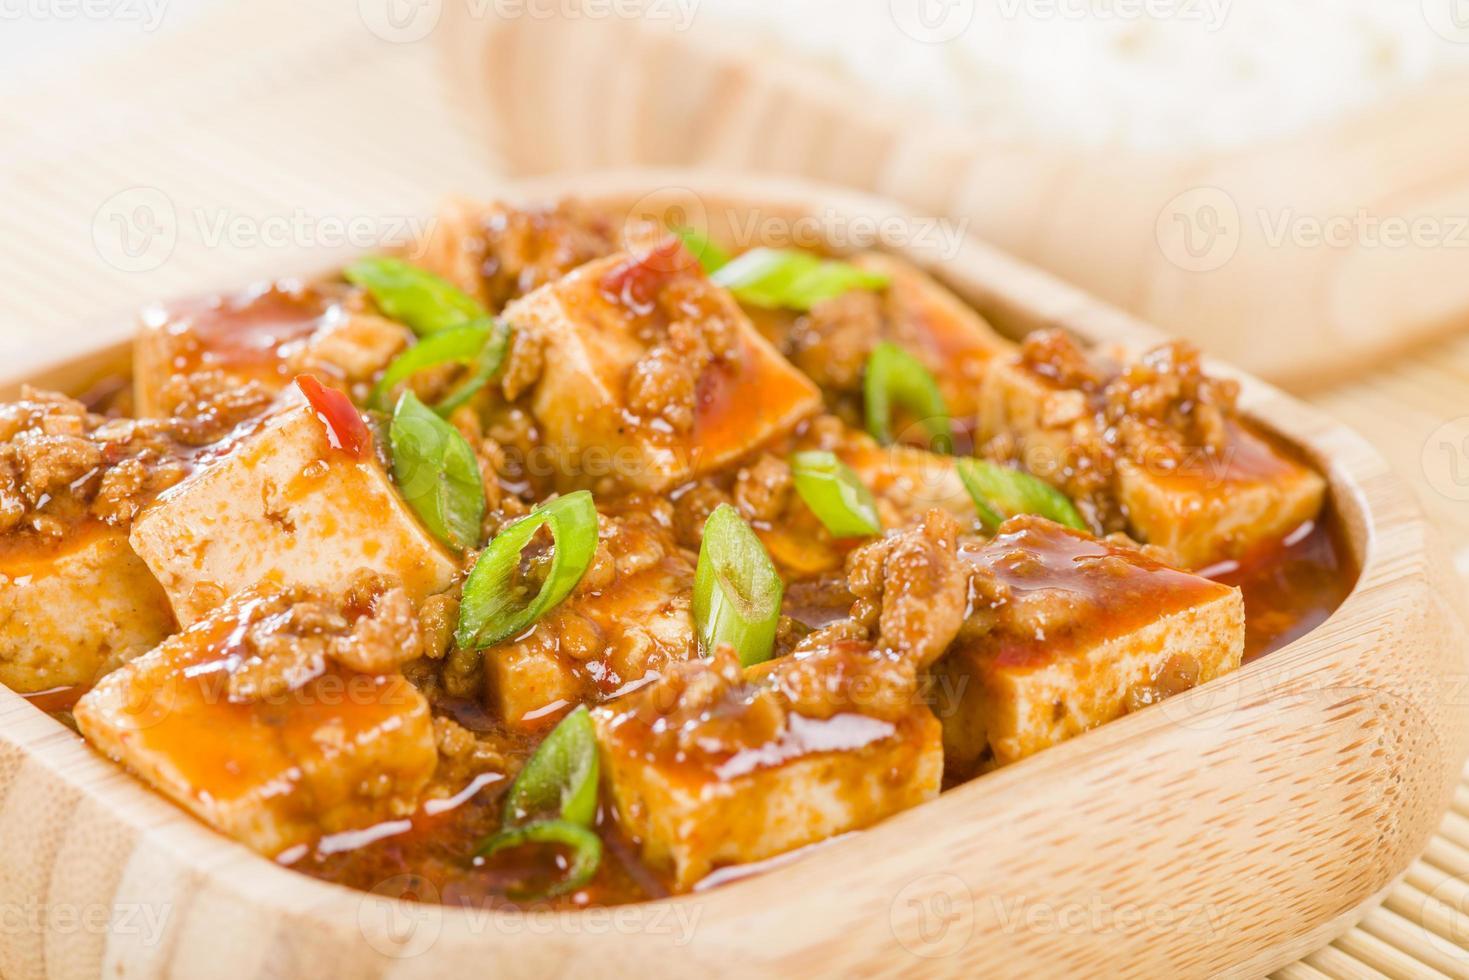 mapo tofu (麻 婆 豆腐) foto